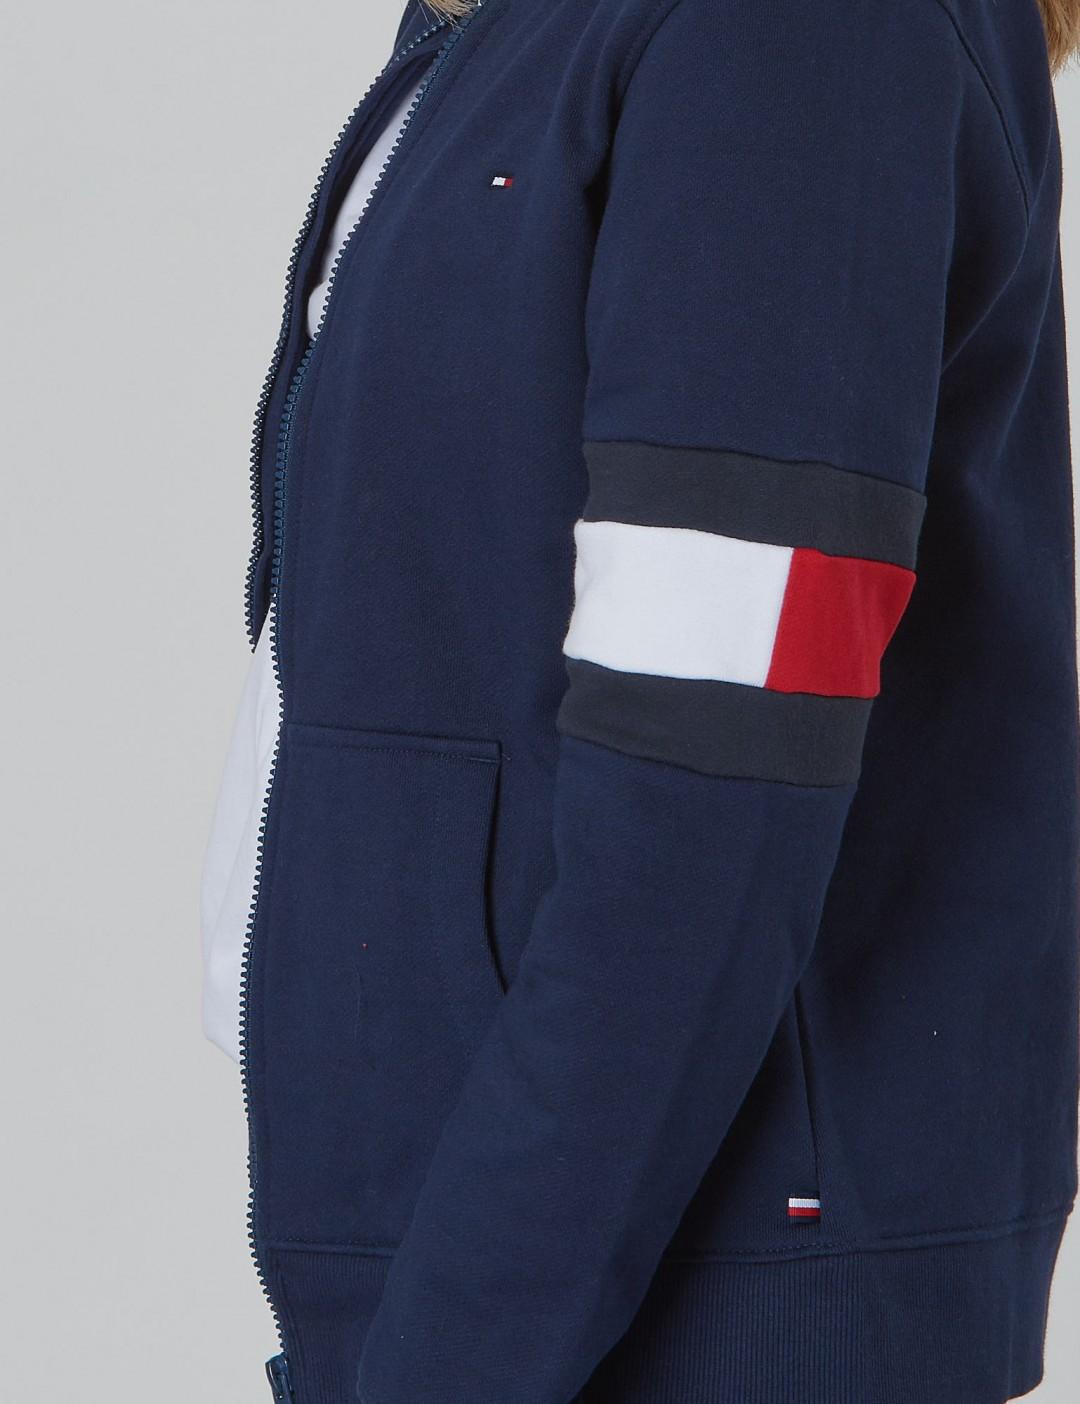 0448d72653bb1 Cut + Sew Flag Tracktop - Blau - Tommy Hilfiger